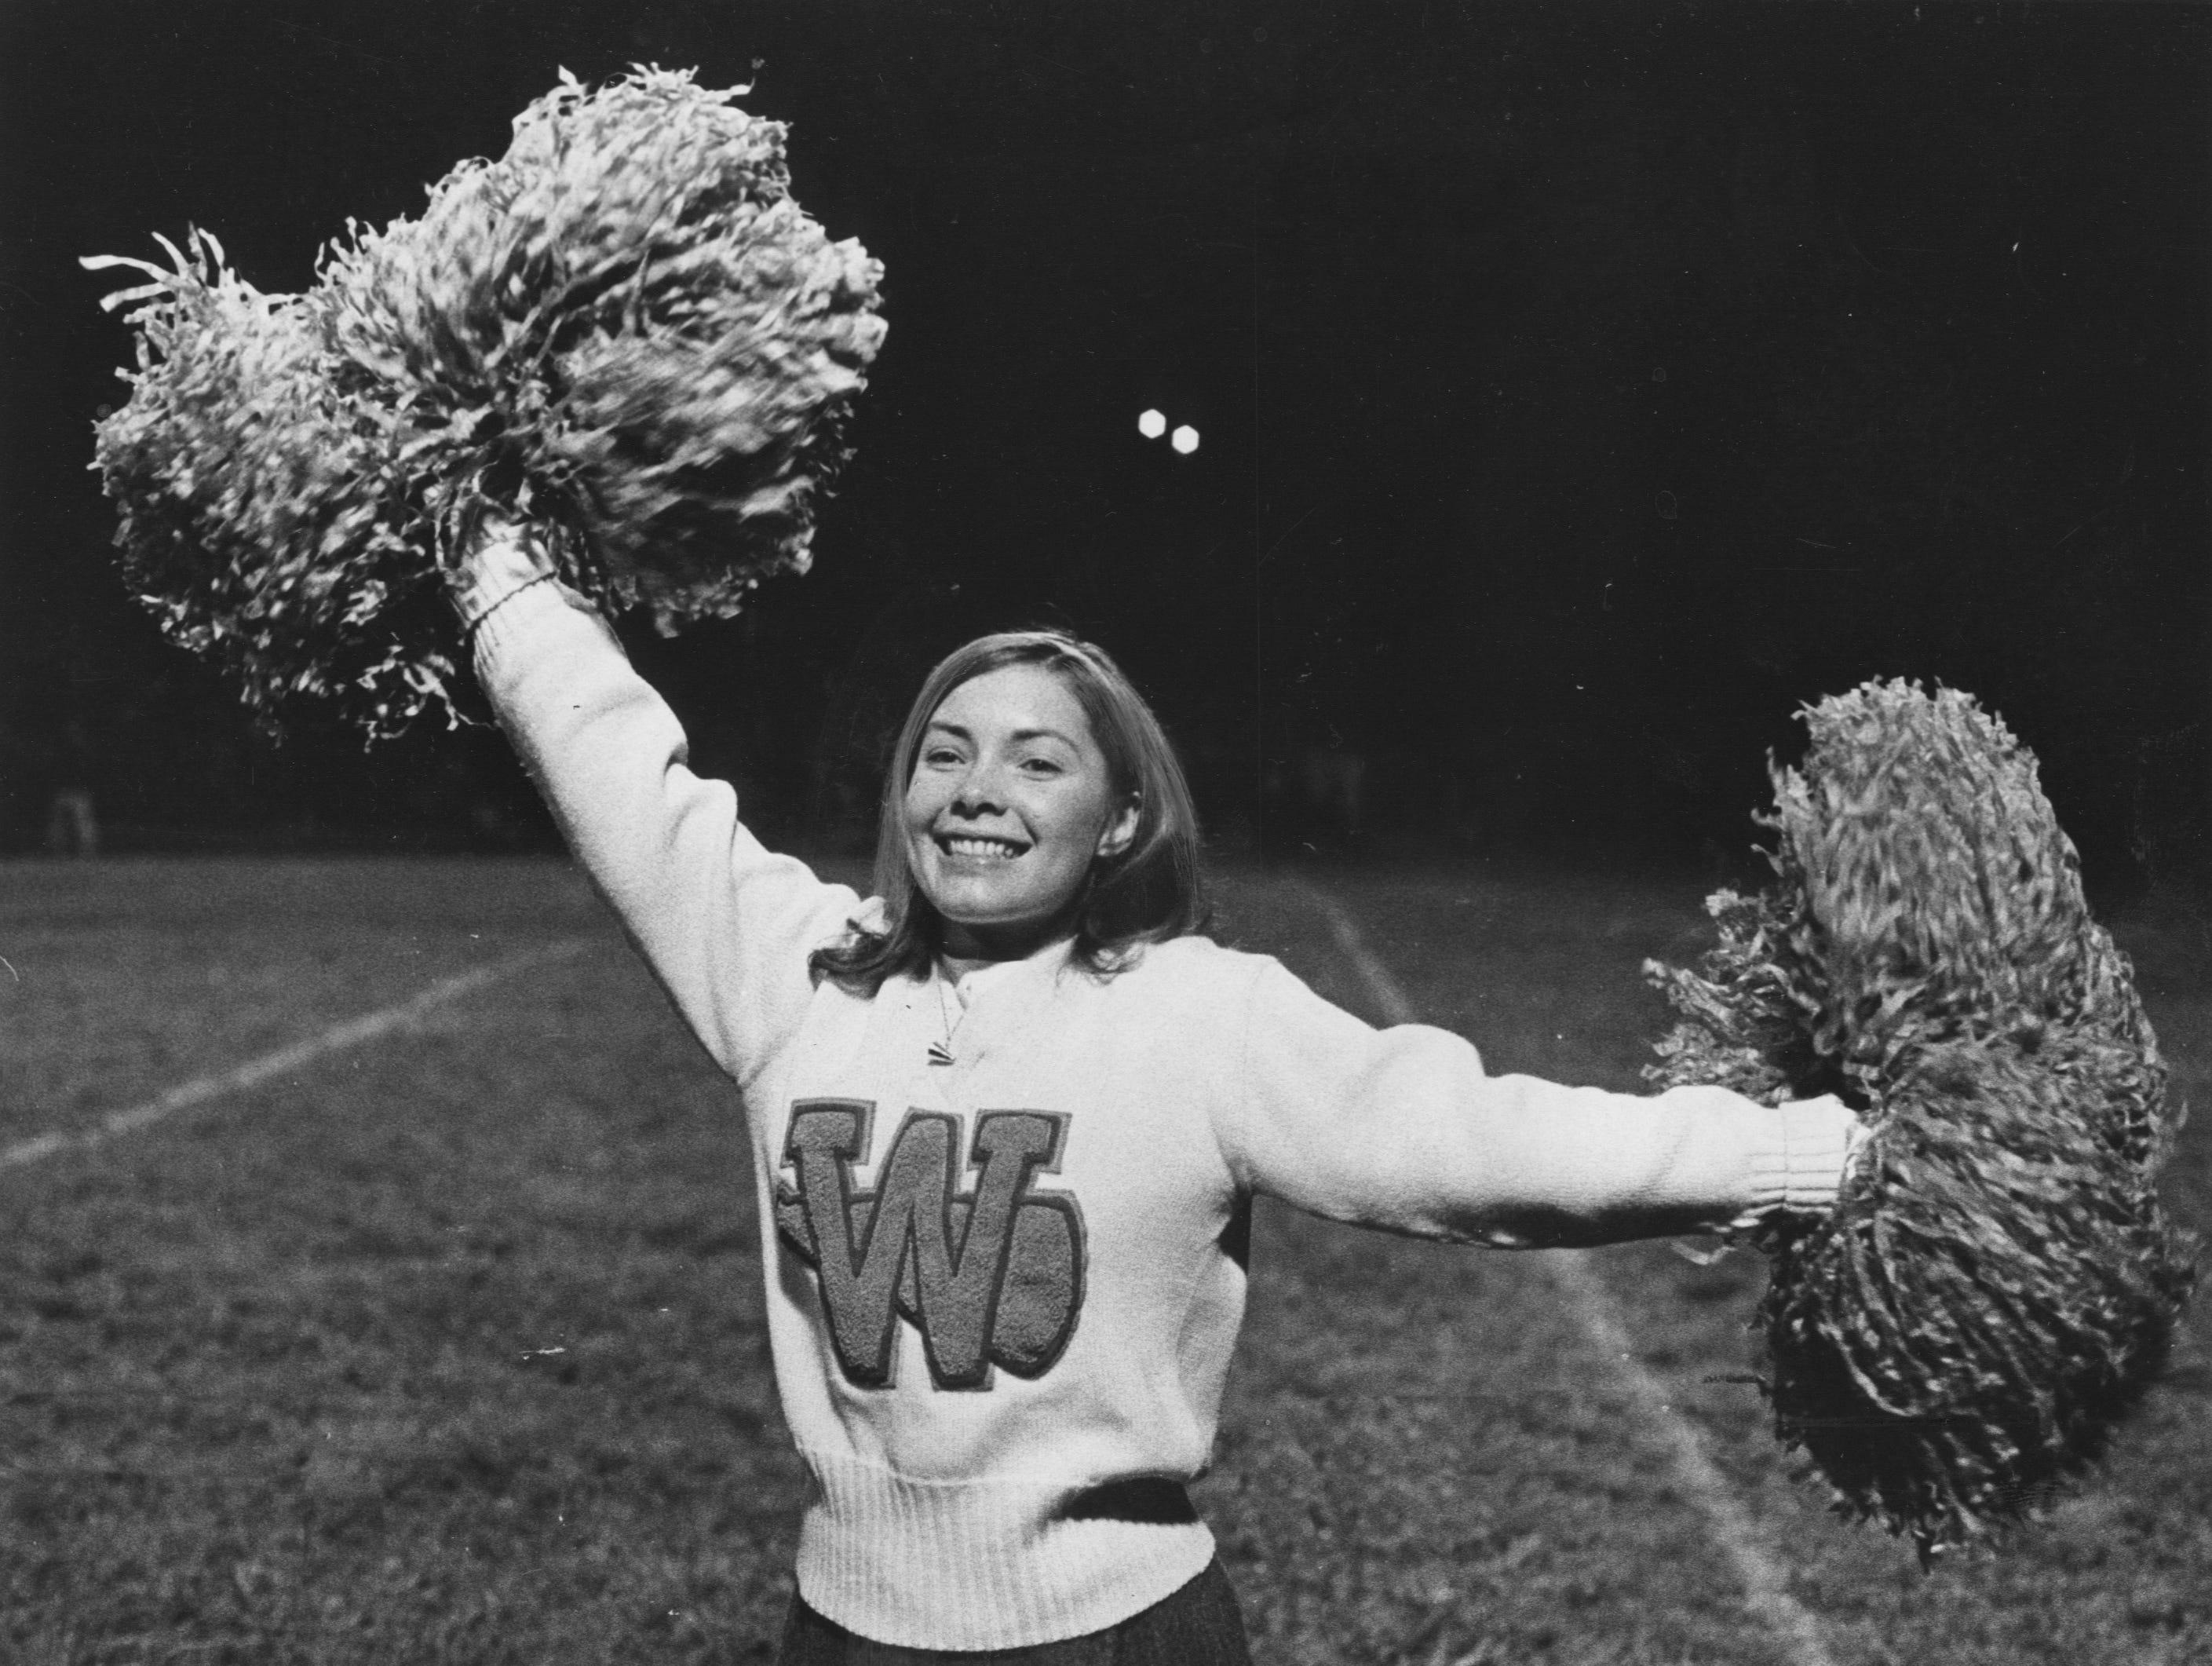 Cheerleader Cindy Millspaugh has been keeping spirits high at Waggener High this football season. Oct. 8, 1965